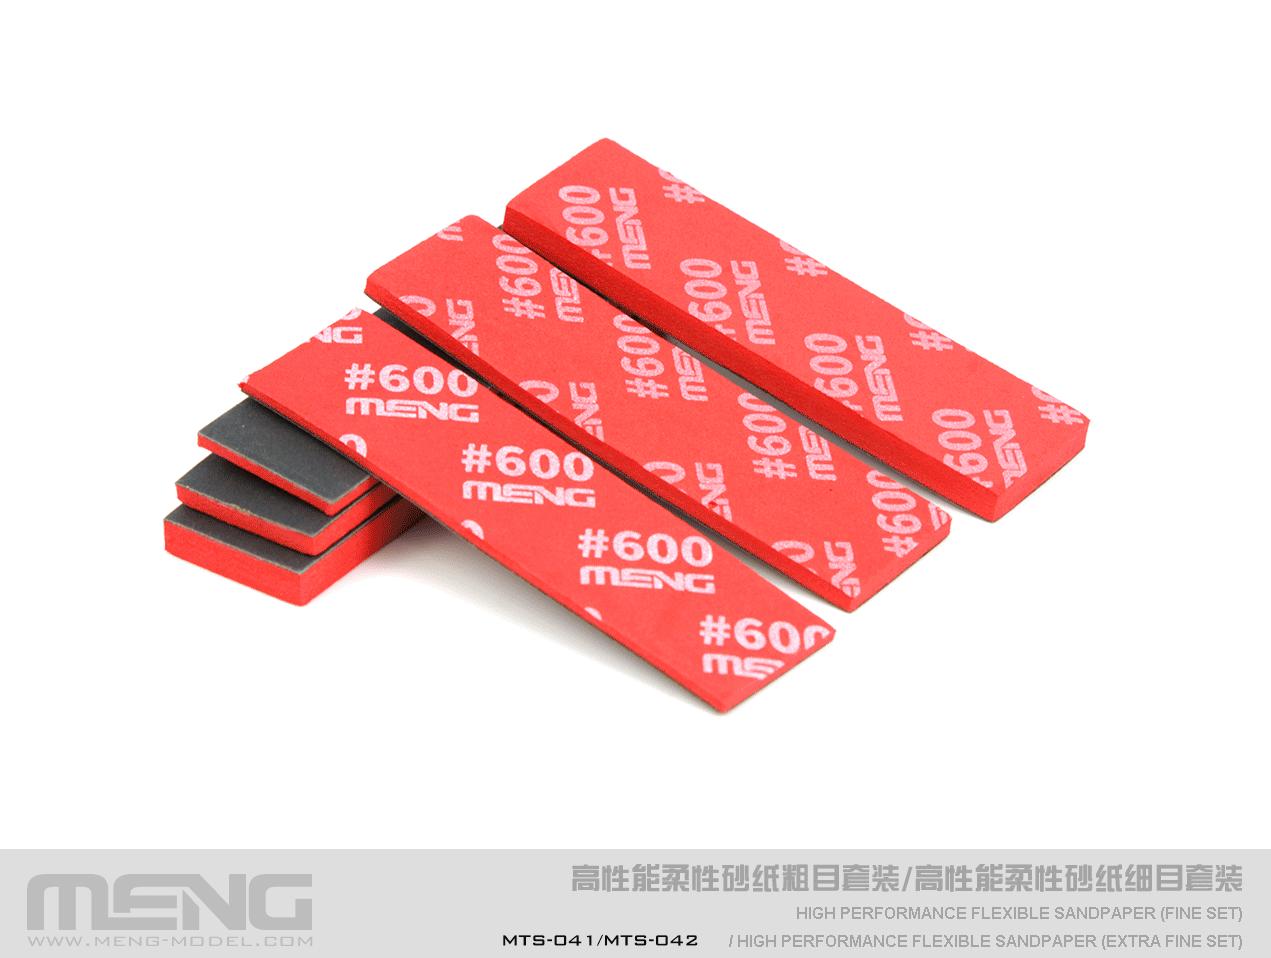 Meng x Dspiae High Performance Flexible Sandpaper Refill Pack (600 Grit), Fine - 6Pcs